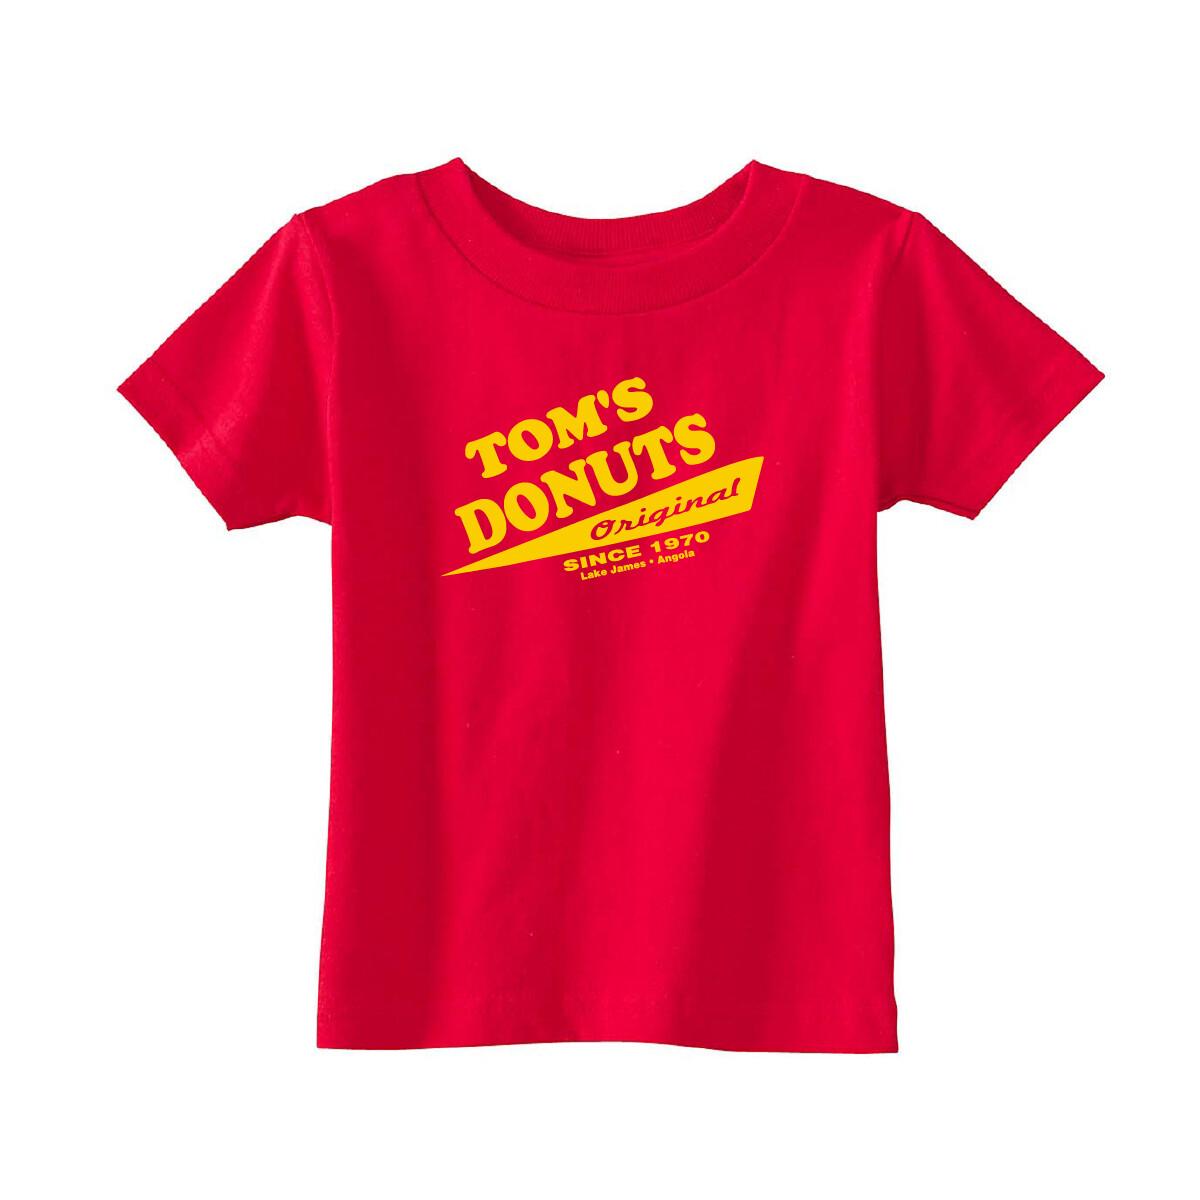 Red Tom's Original Kids Tee